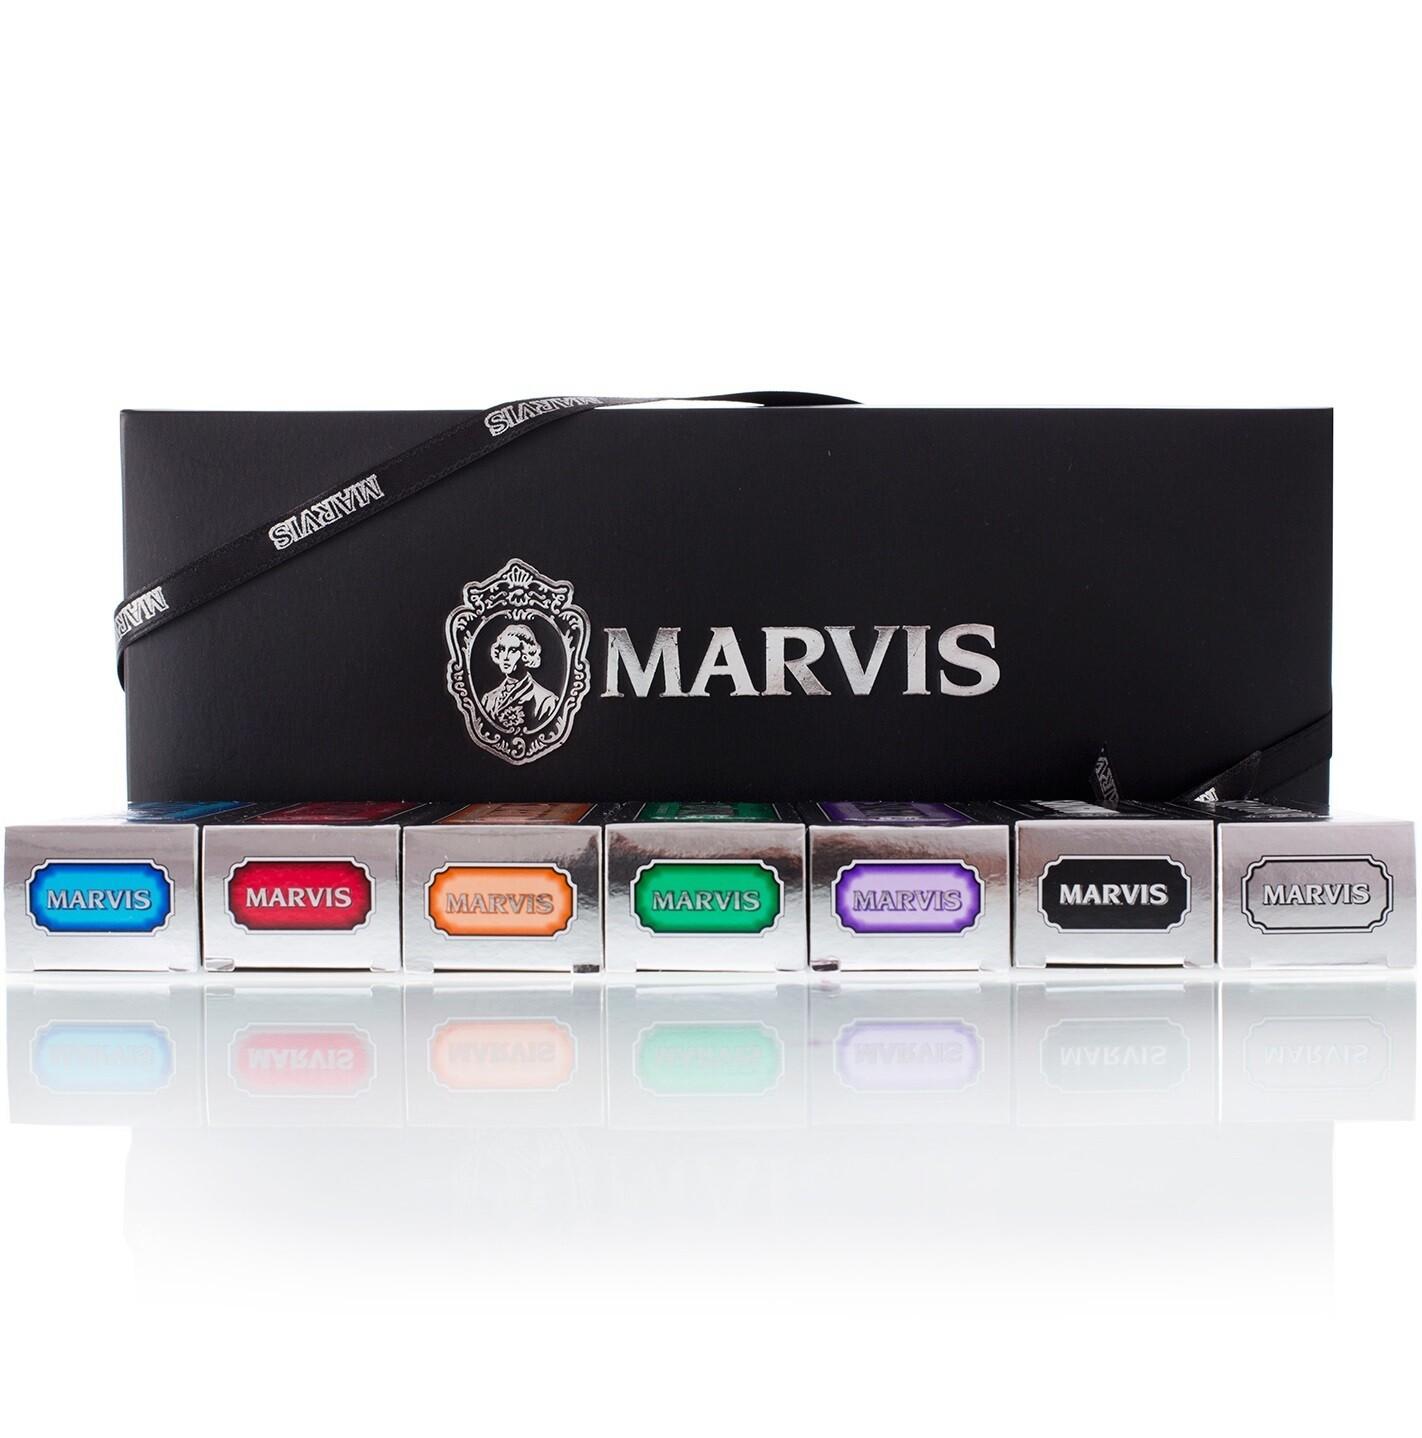 Marvis Gift Set Black - Подарочный набор из 7 зубных паст по 25 мл